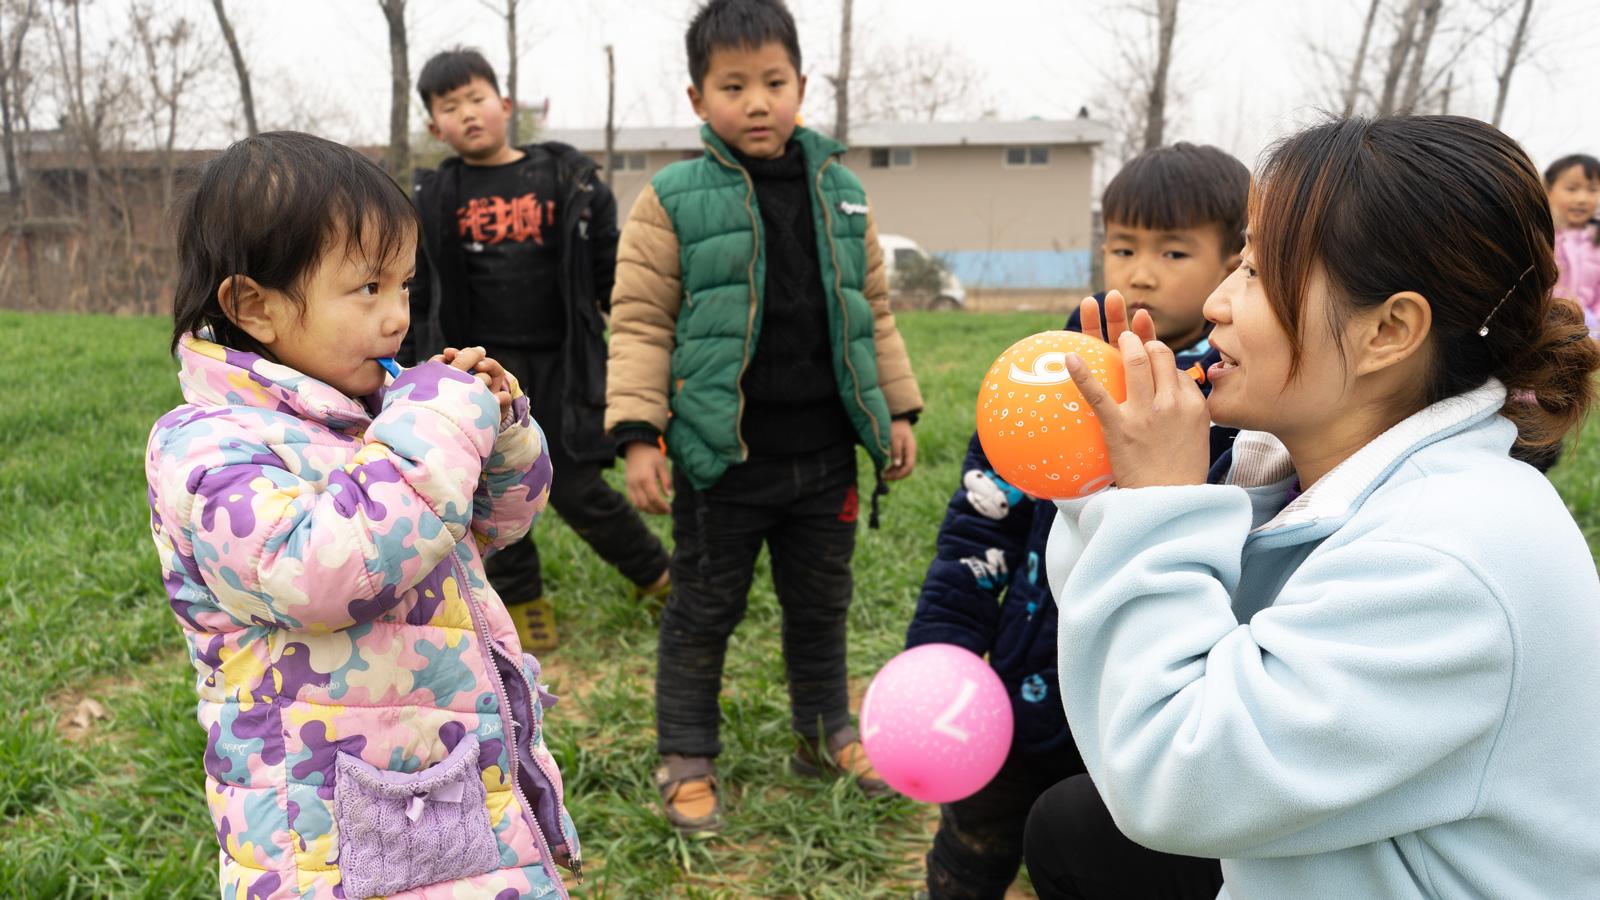 Zhenzhen blows a balloon with her teacher